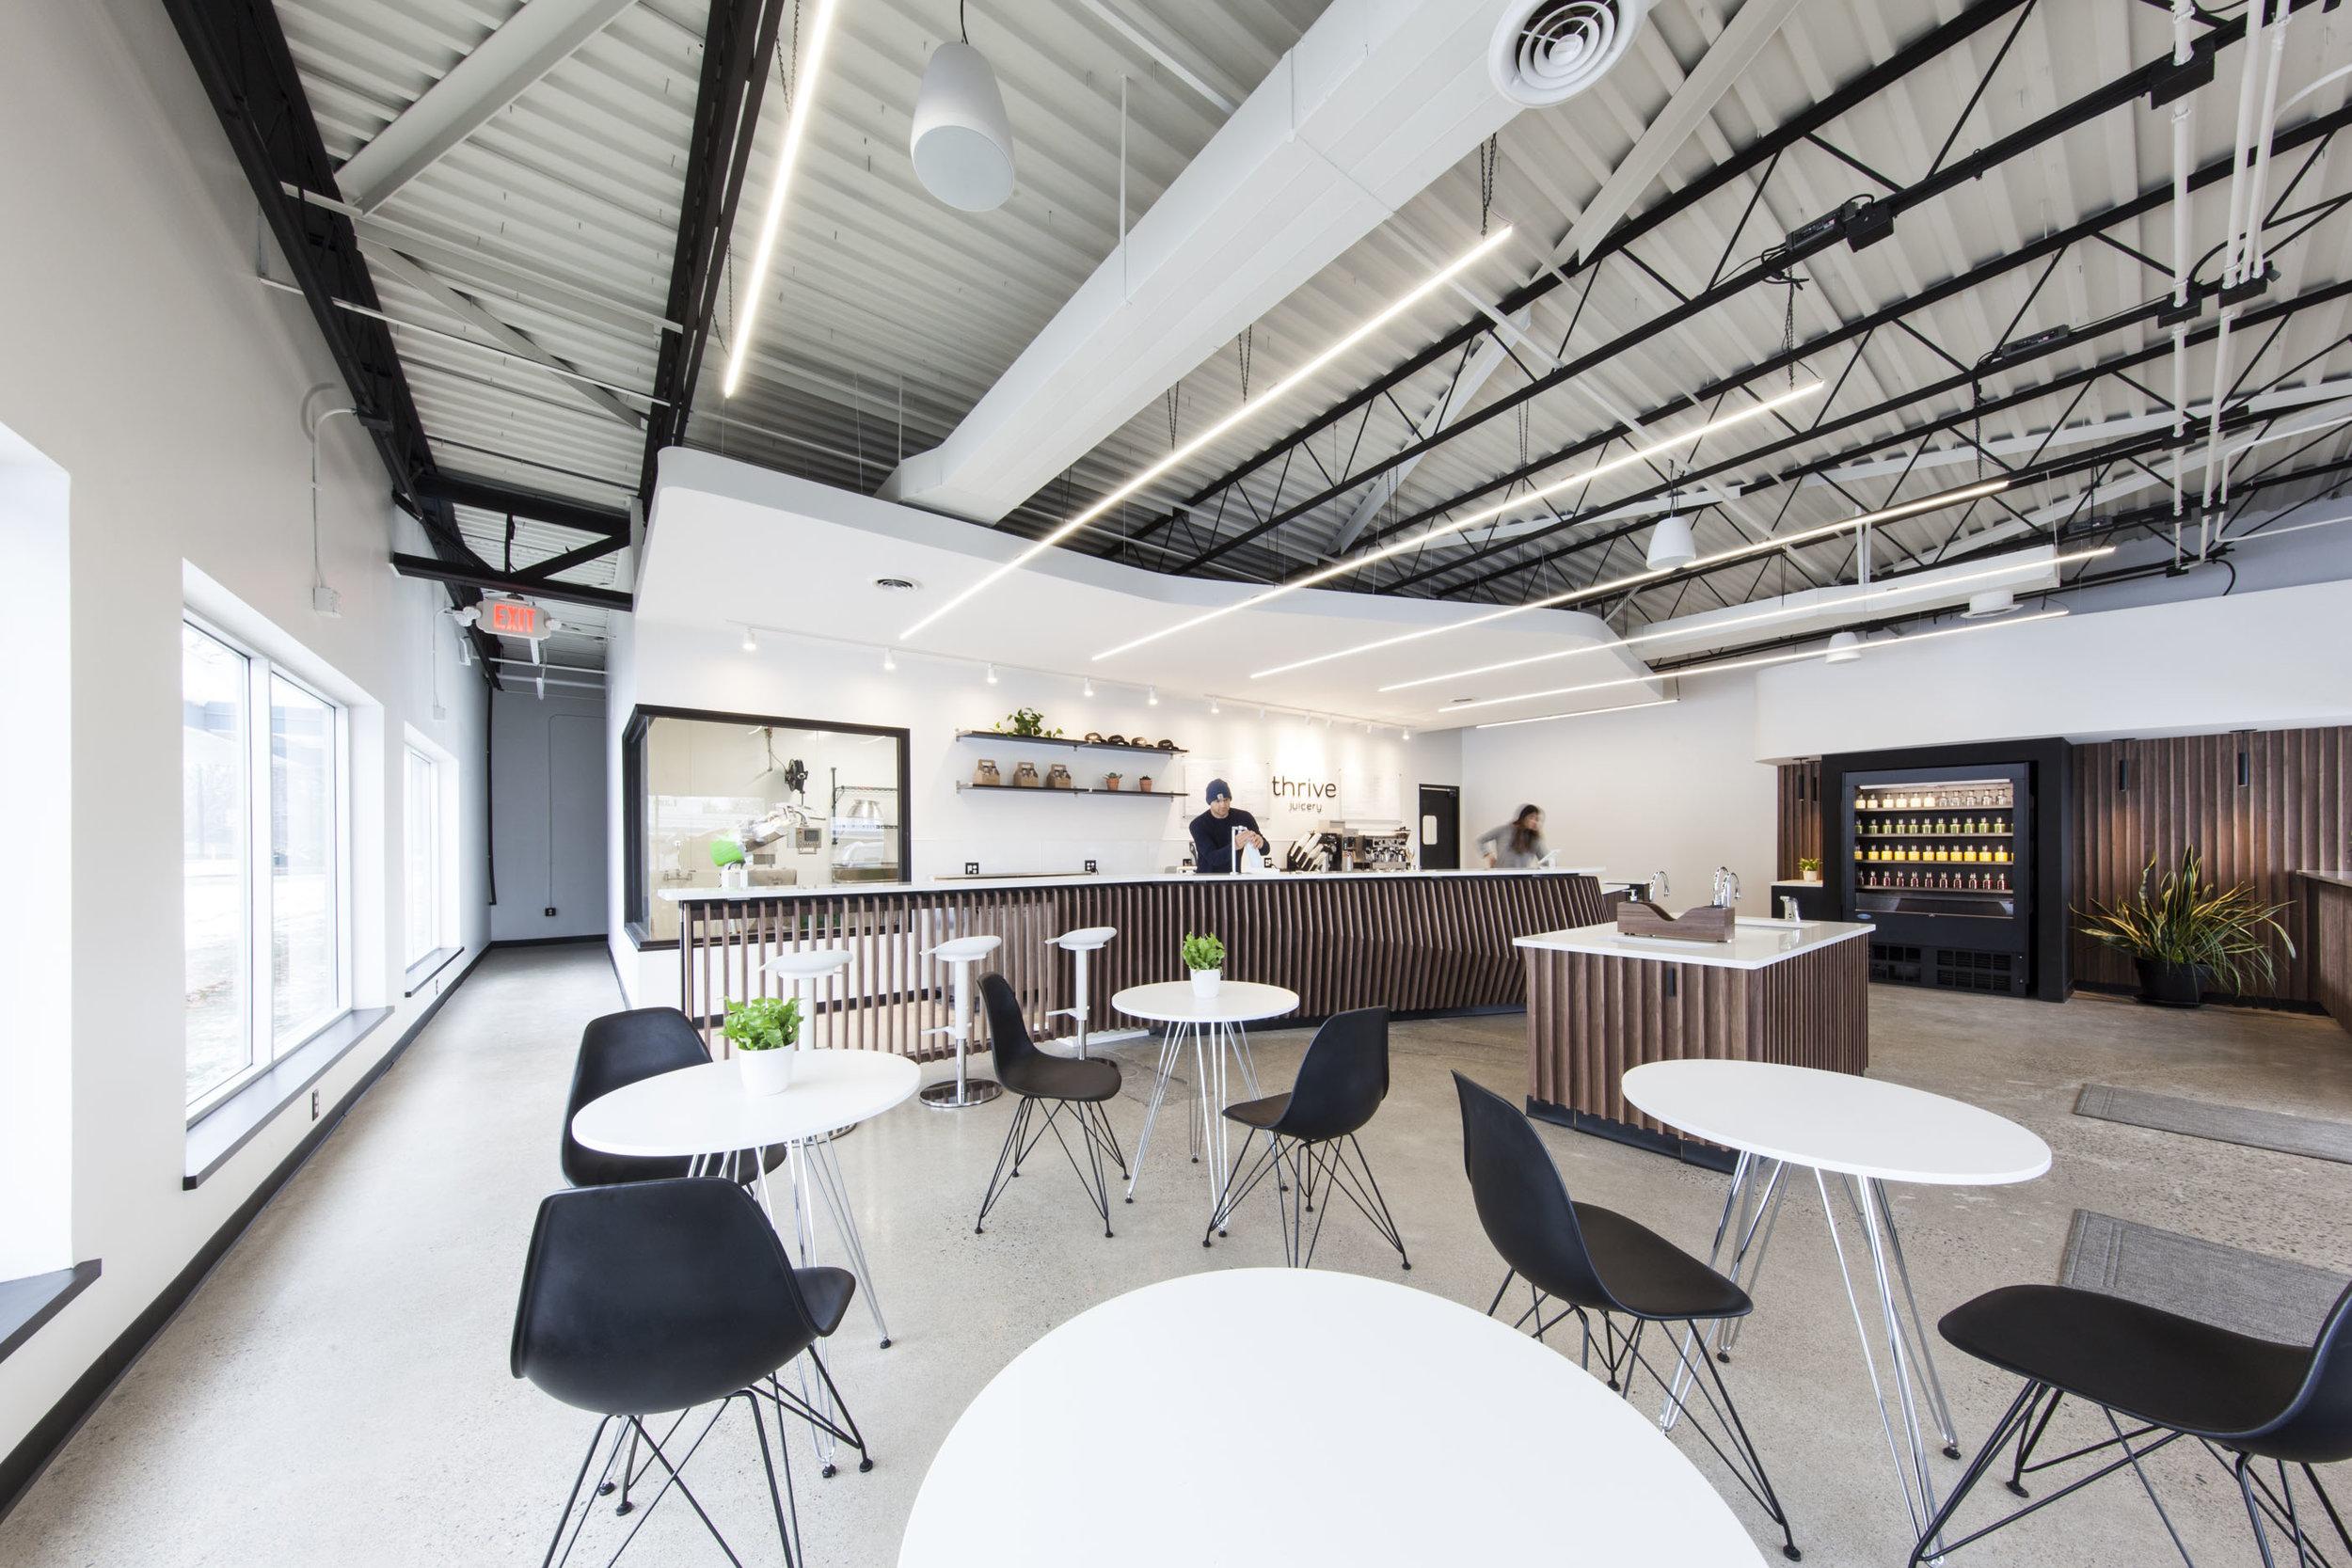 Thrive Juicery Ann Arbor by Synecdoche Design Studio